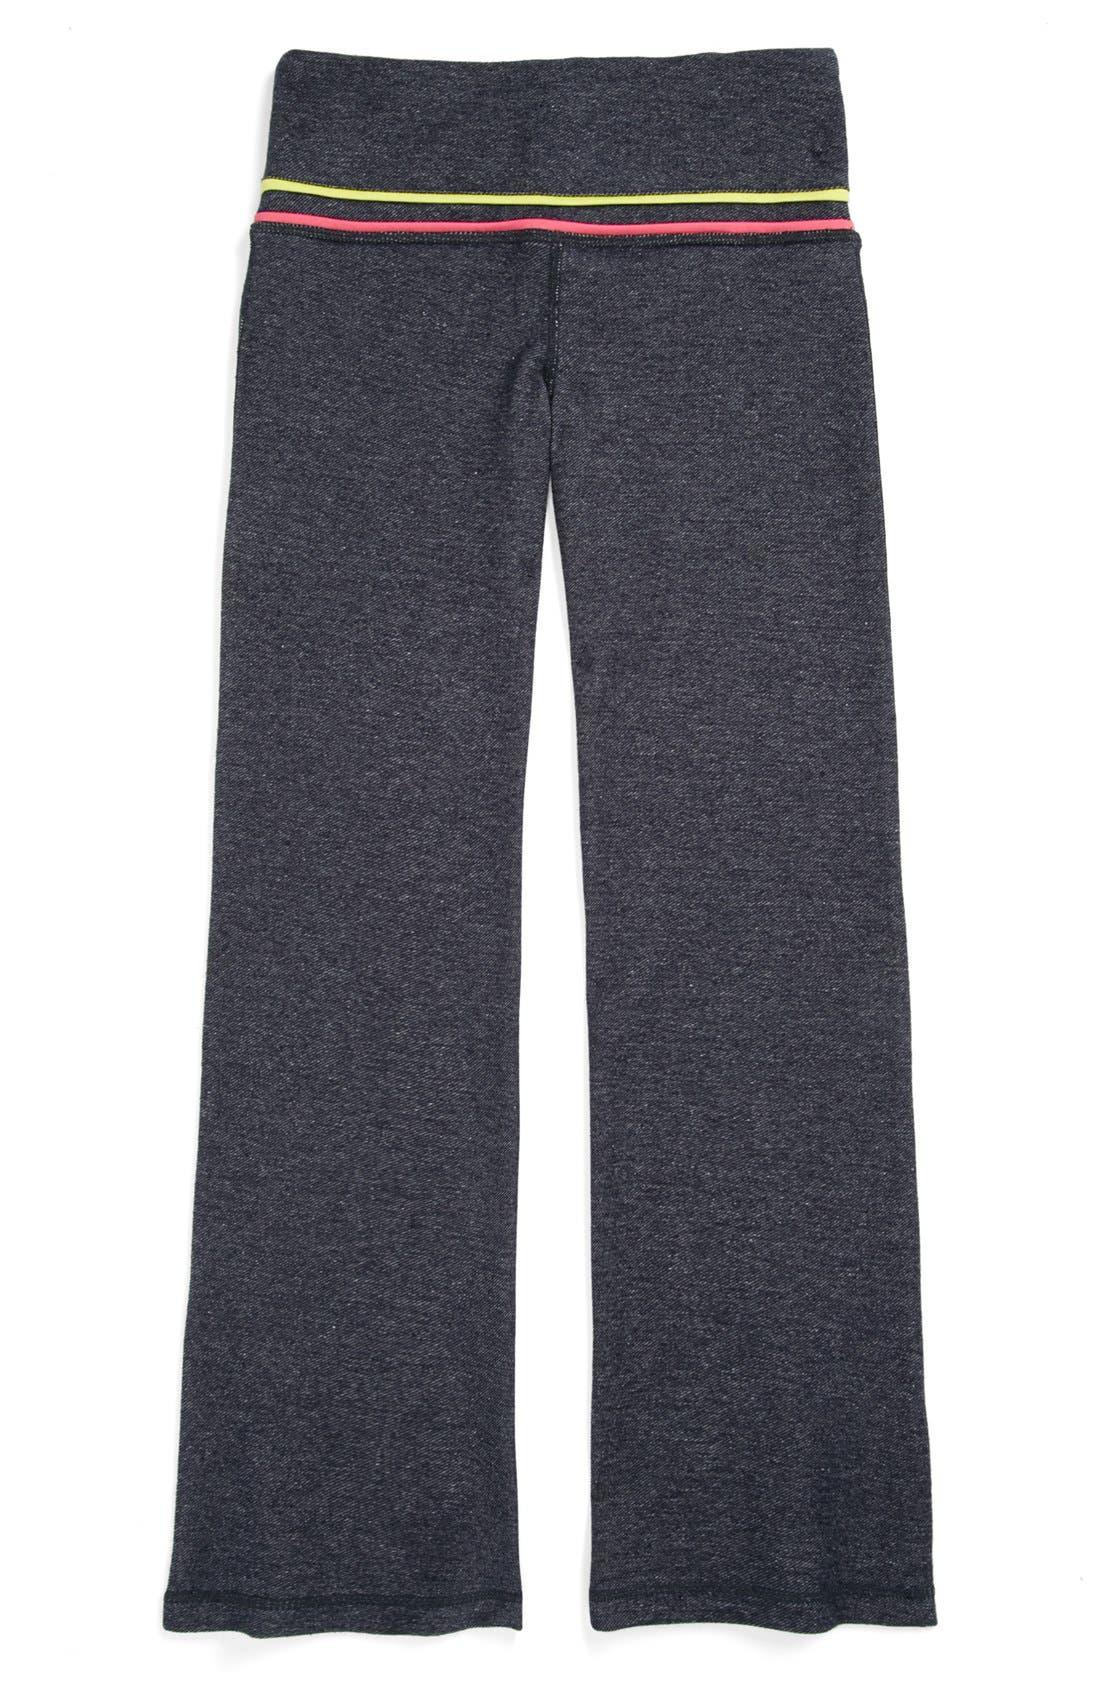 Alternate Image 1 Selected - Limeapple 'Asana' Pants (Big Girls)